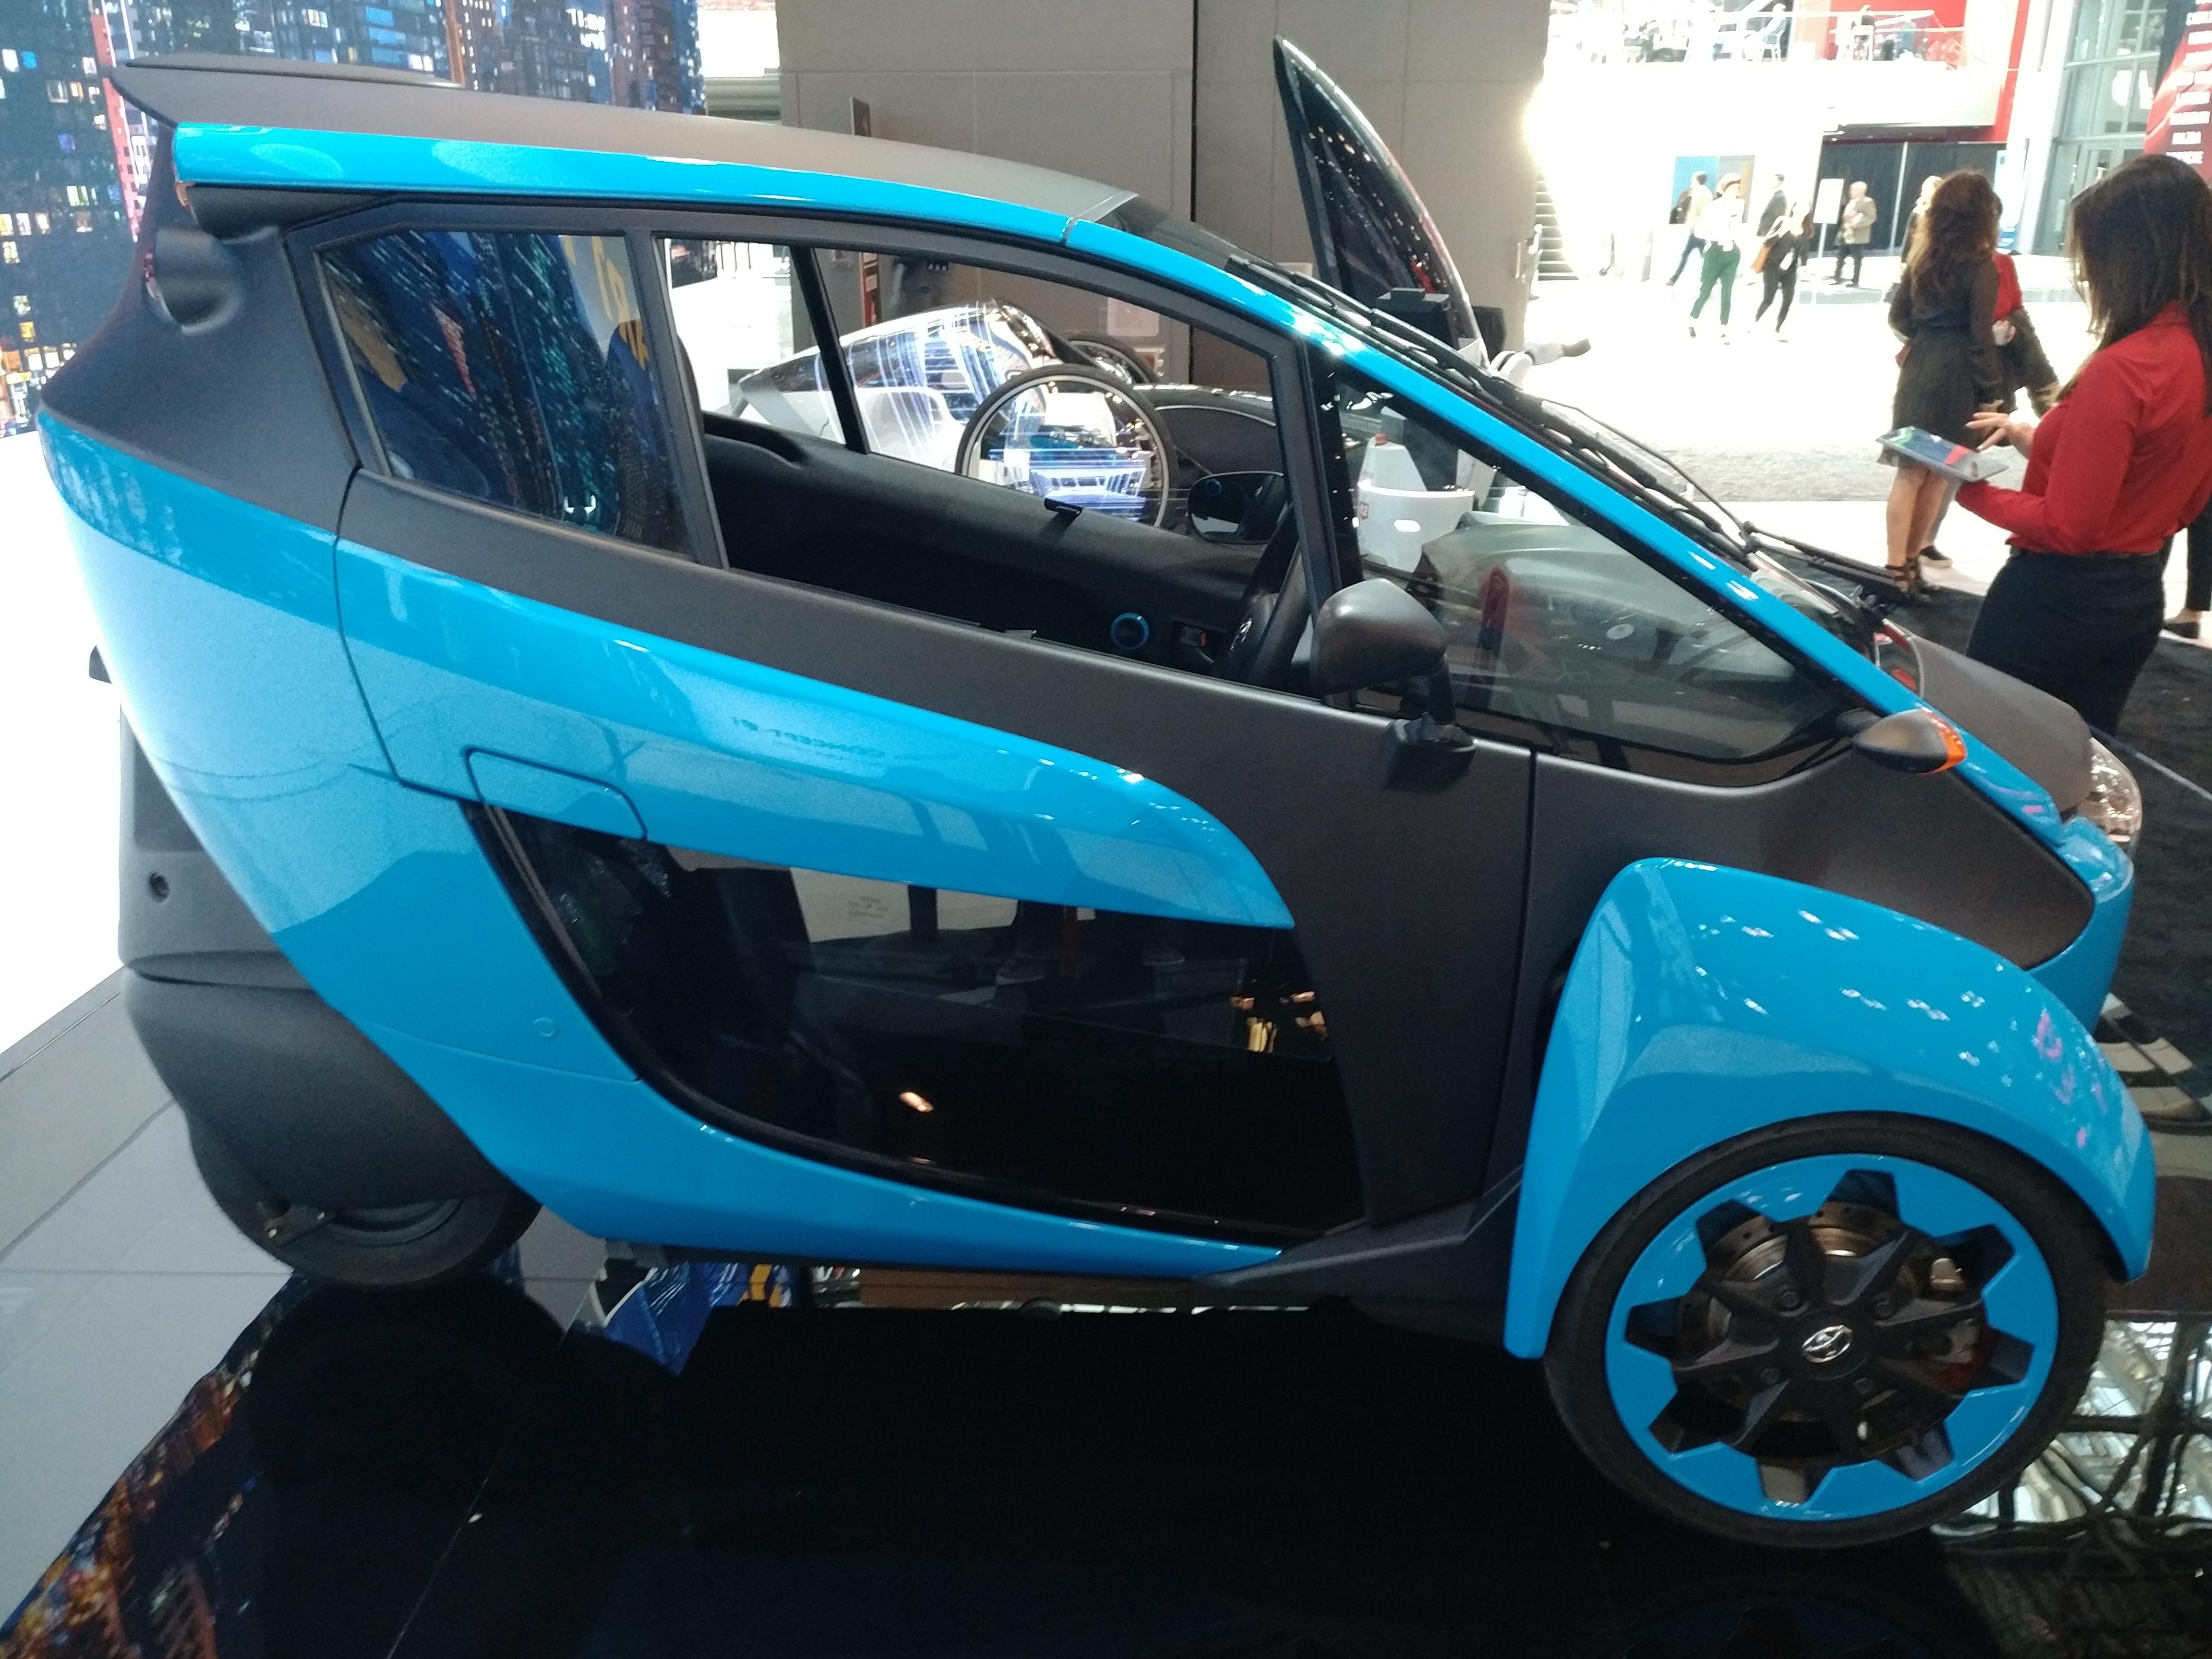 Toyota i-Road (Evan Bleier/InsideHook)